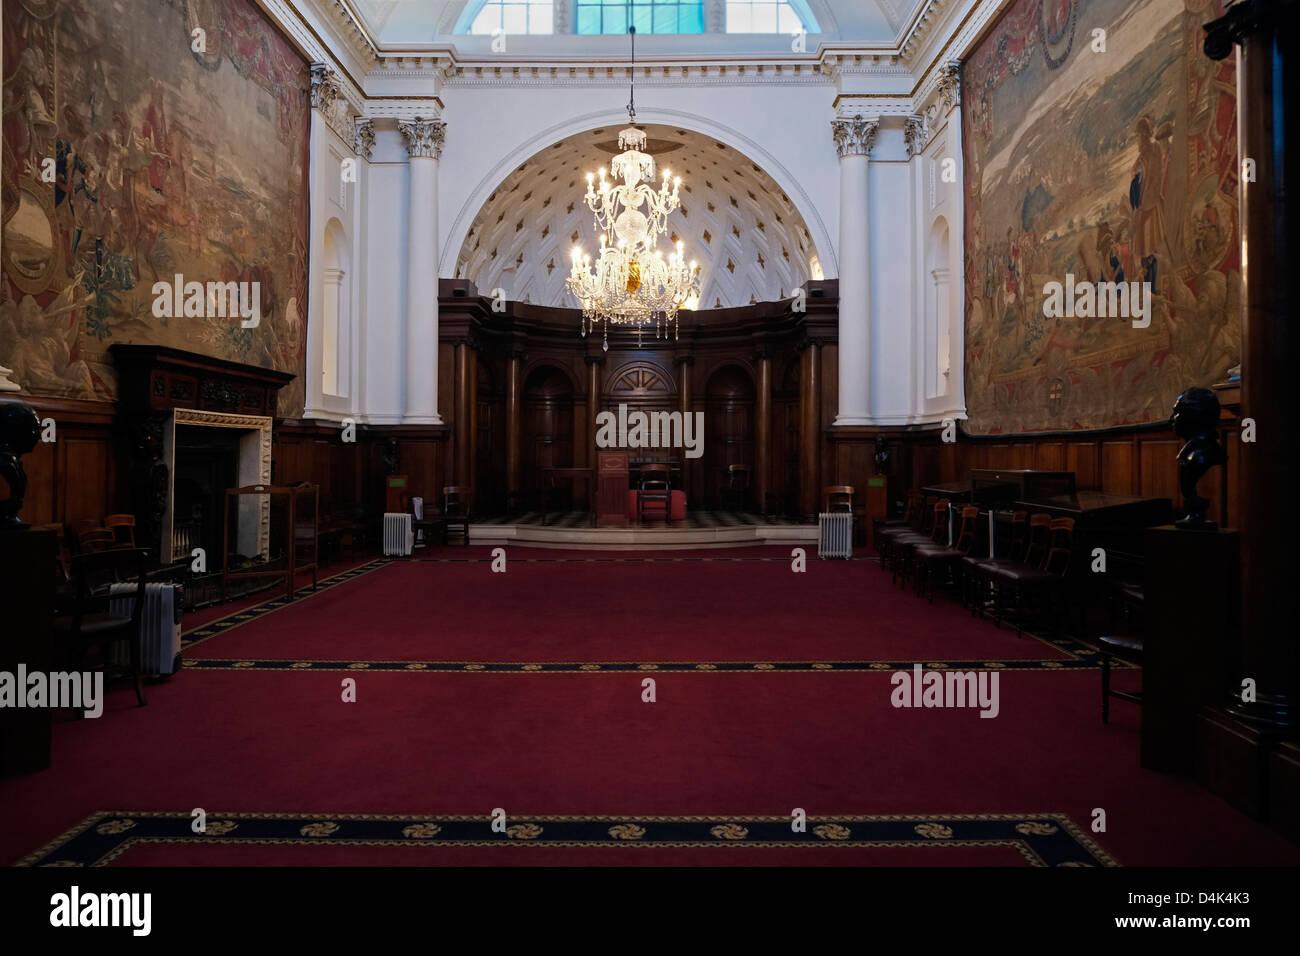 Parliament Room Bank of Ireland Dublin - Stock Image